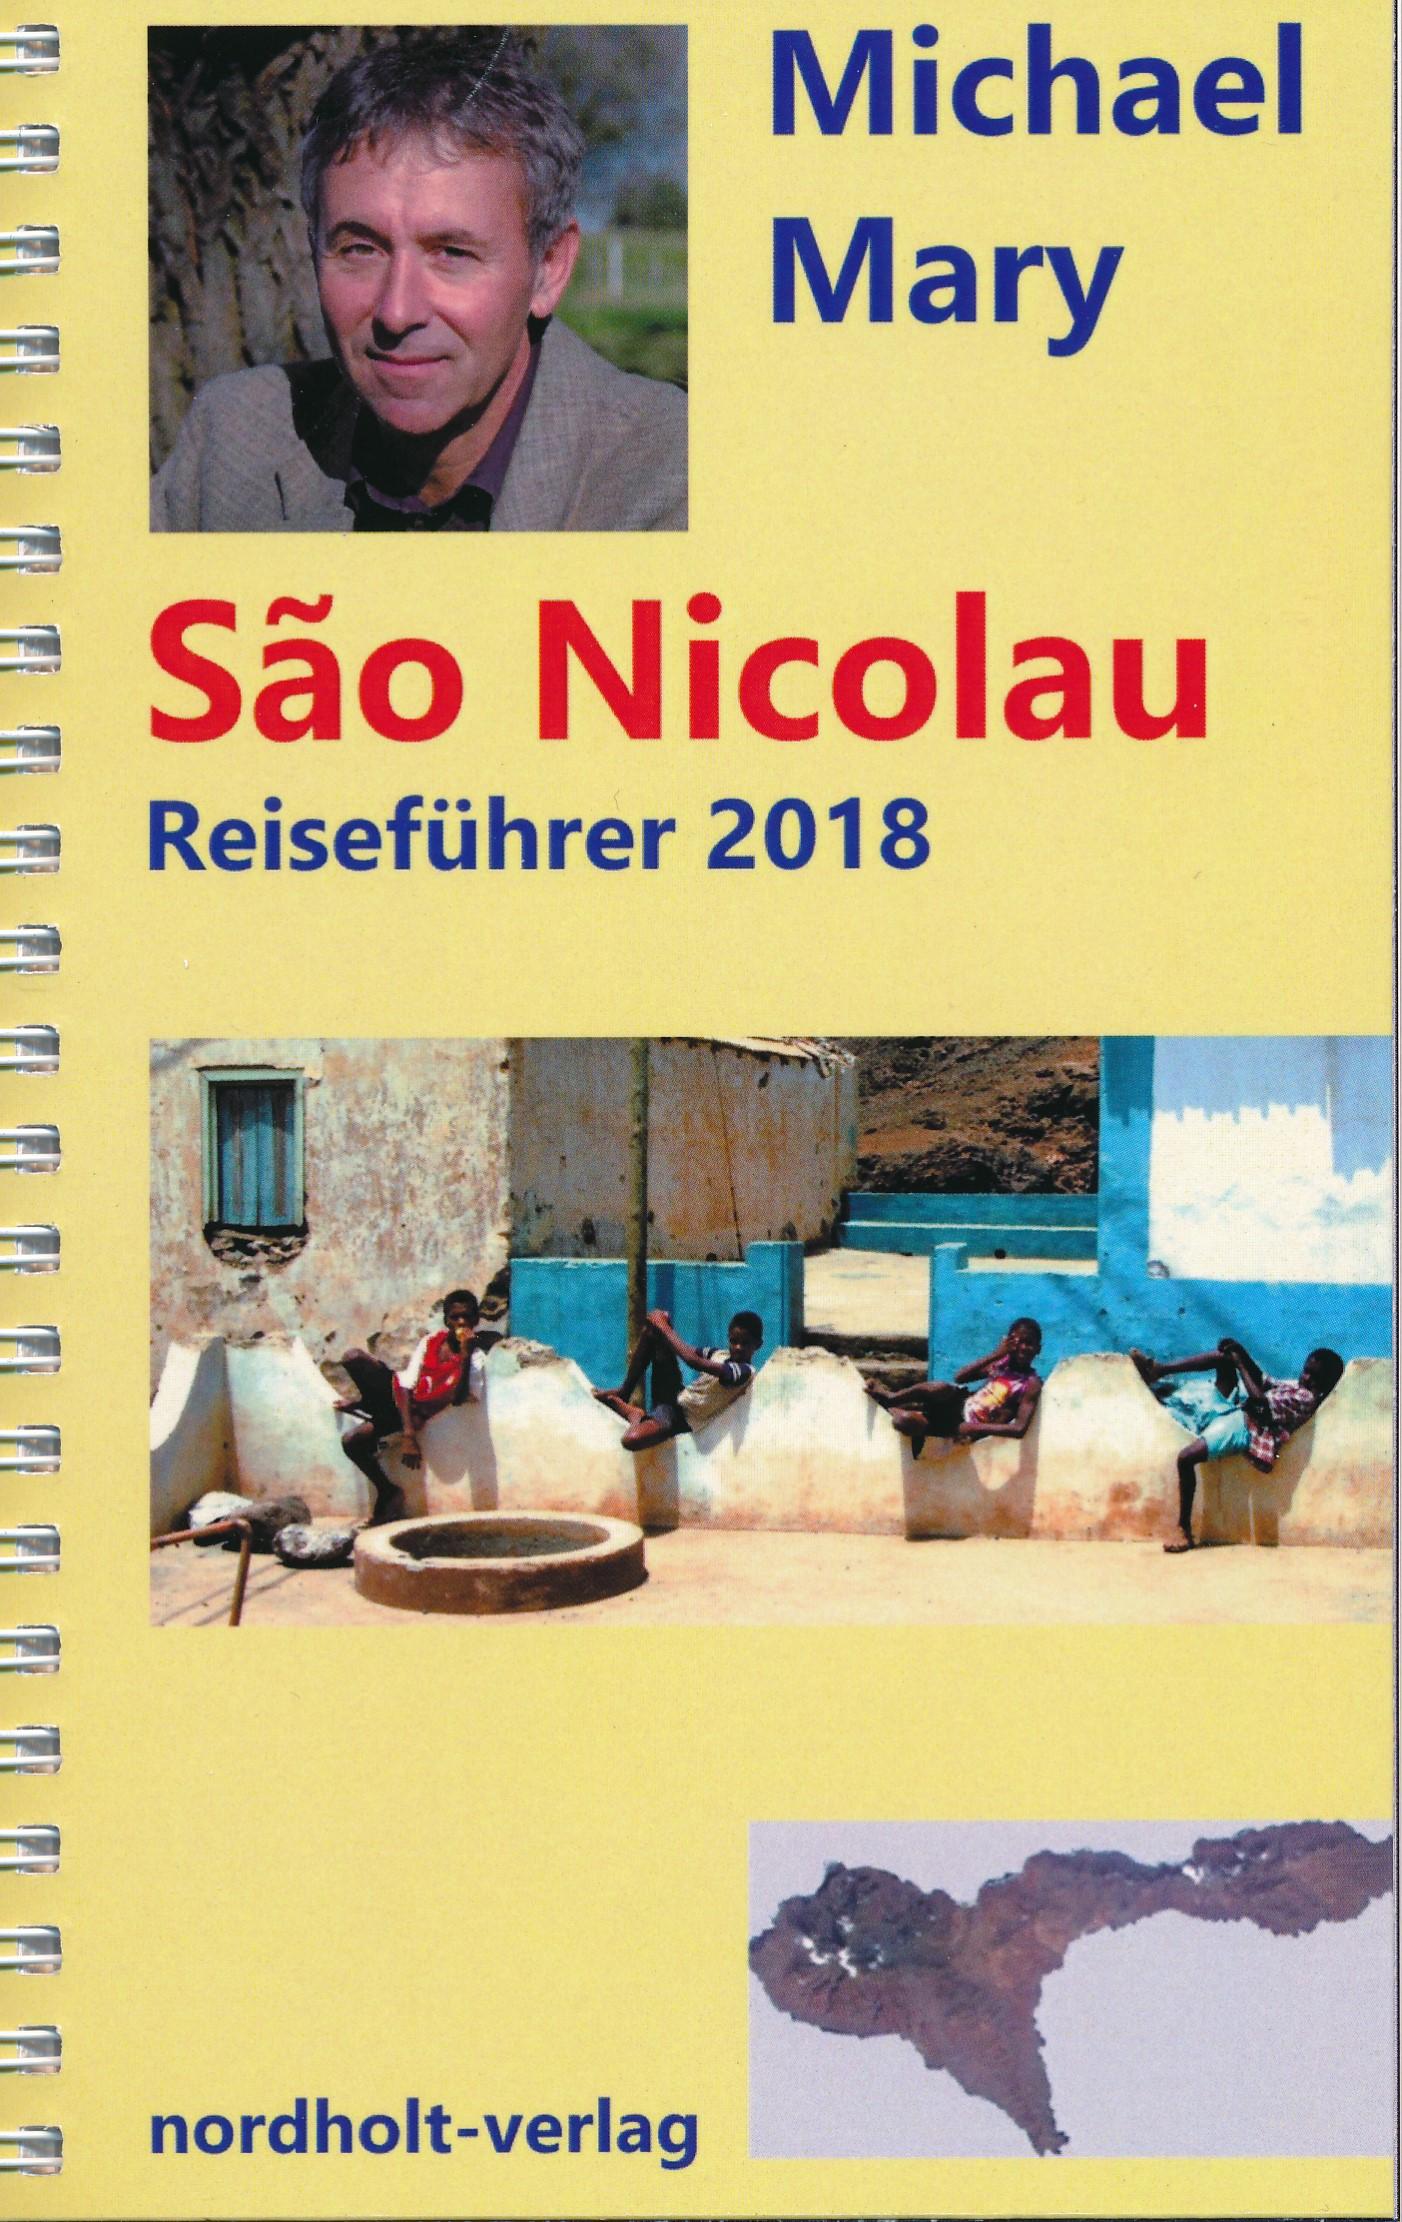 Reisgids Sao Nicolau - Kaapverdië   Nordholt verlag